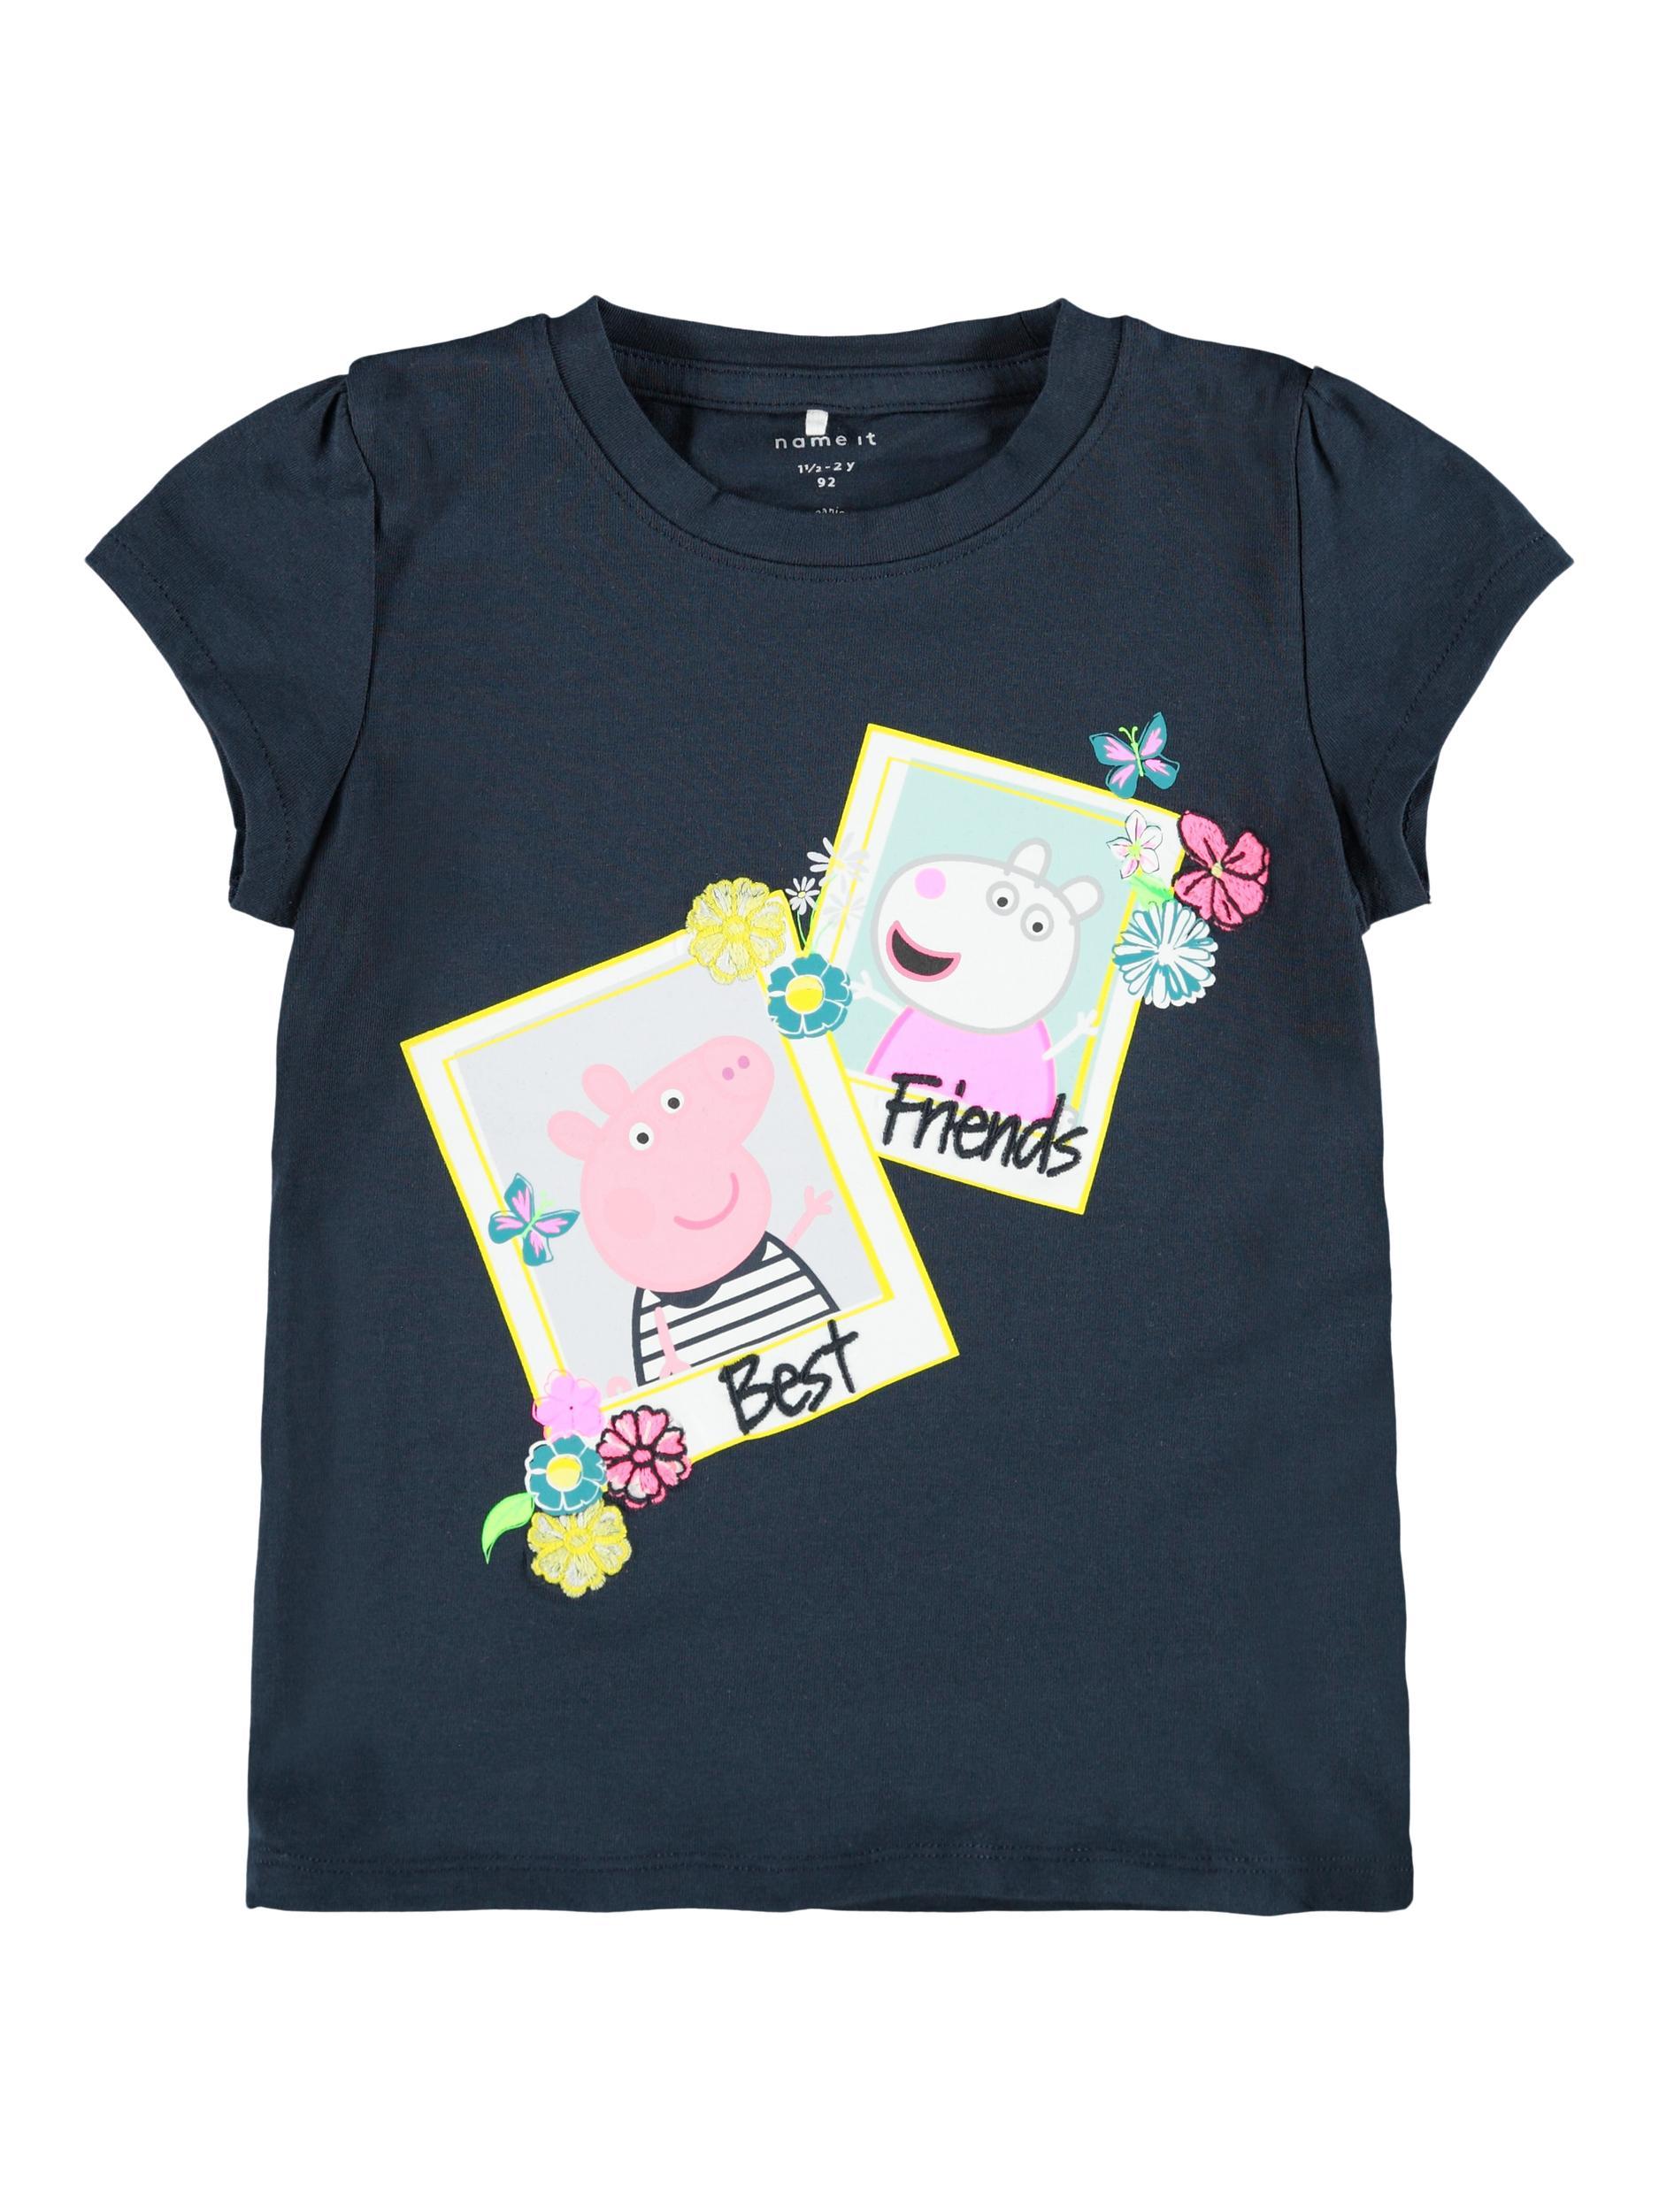 Name It Gurli Gris t-shirt, dark sapphire, 98